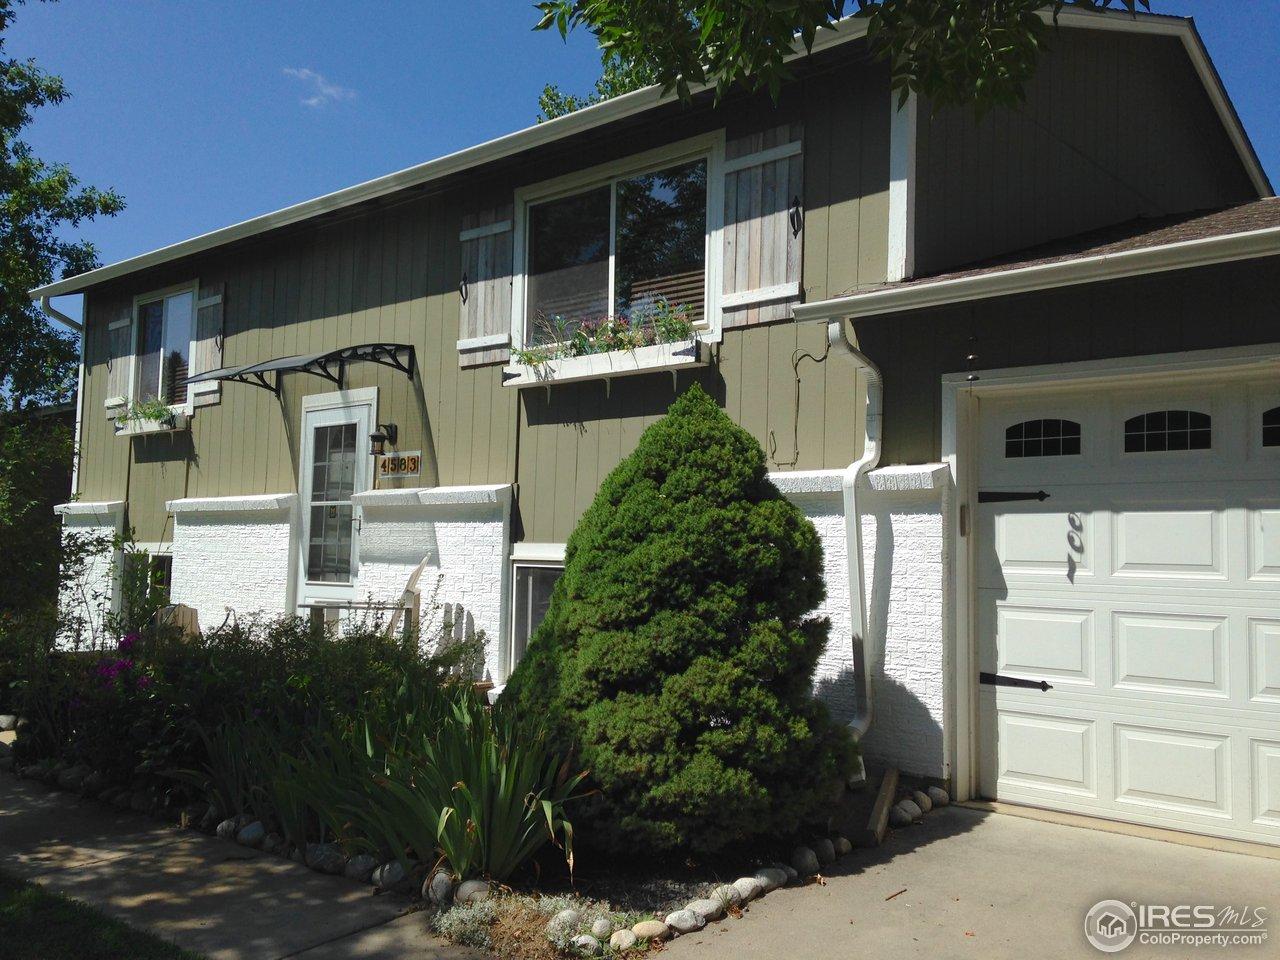 4583 Ashfield Dr, Boulder CO 80301